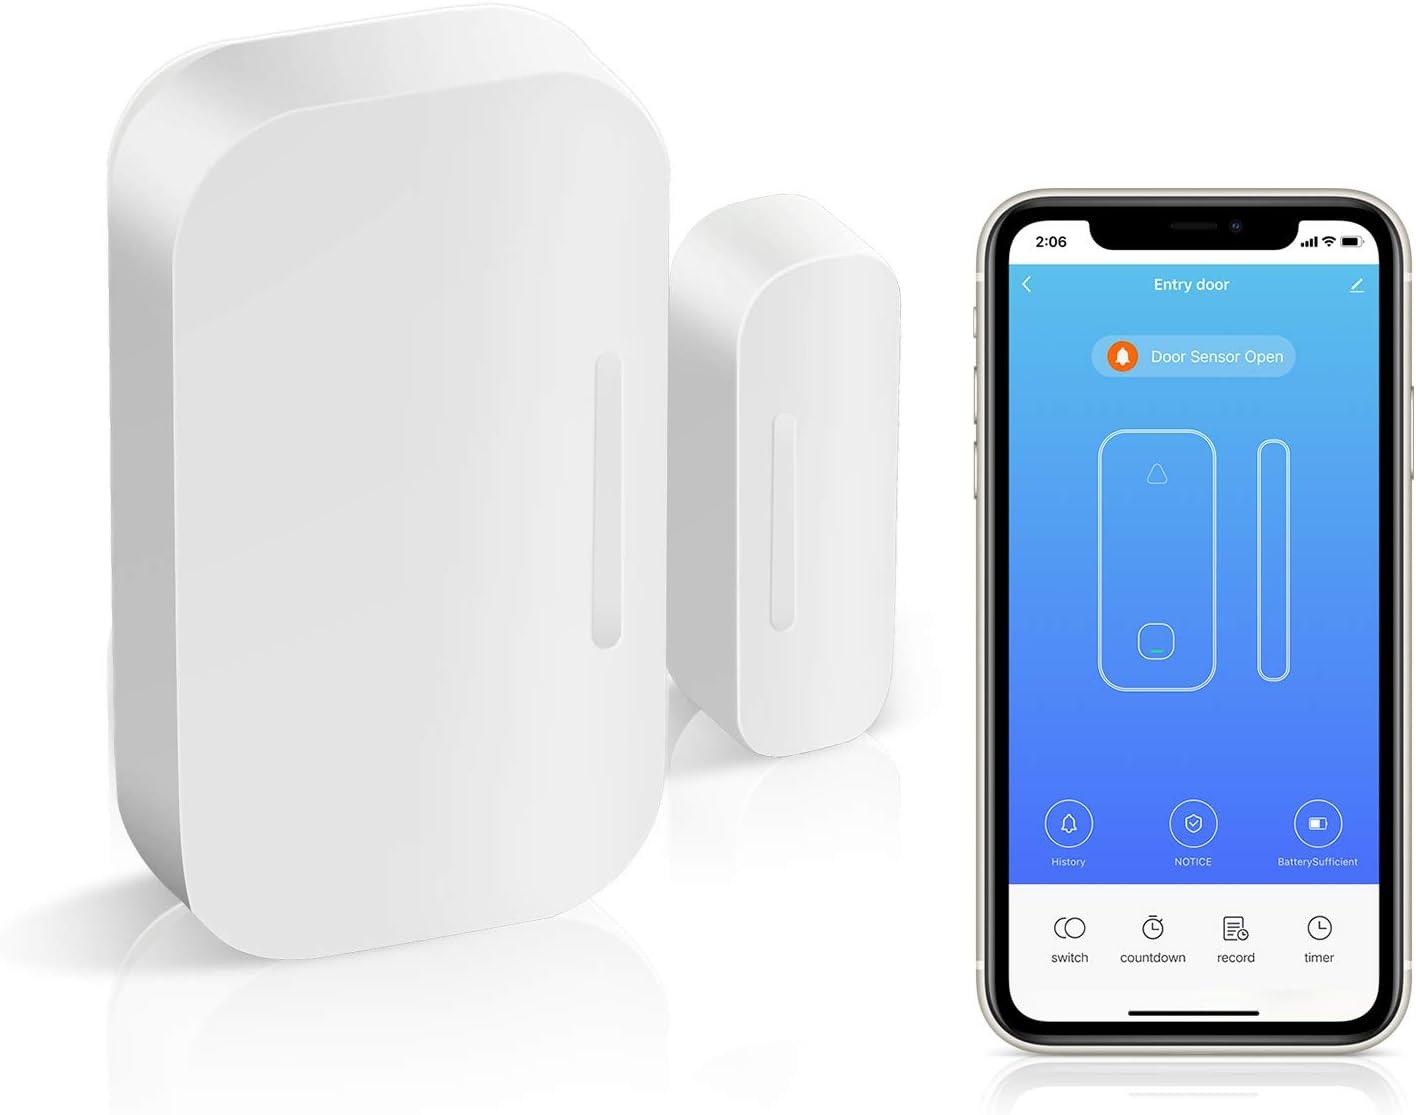 AGSHome Alarma de puerta y ventana inal/ámbrica sensor de ventana con aplicaci/ón Smart Life